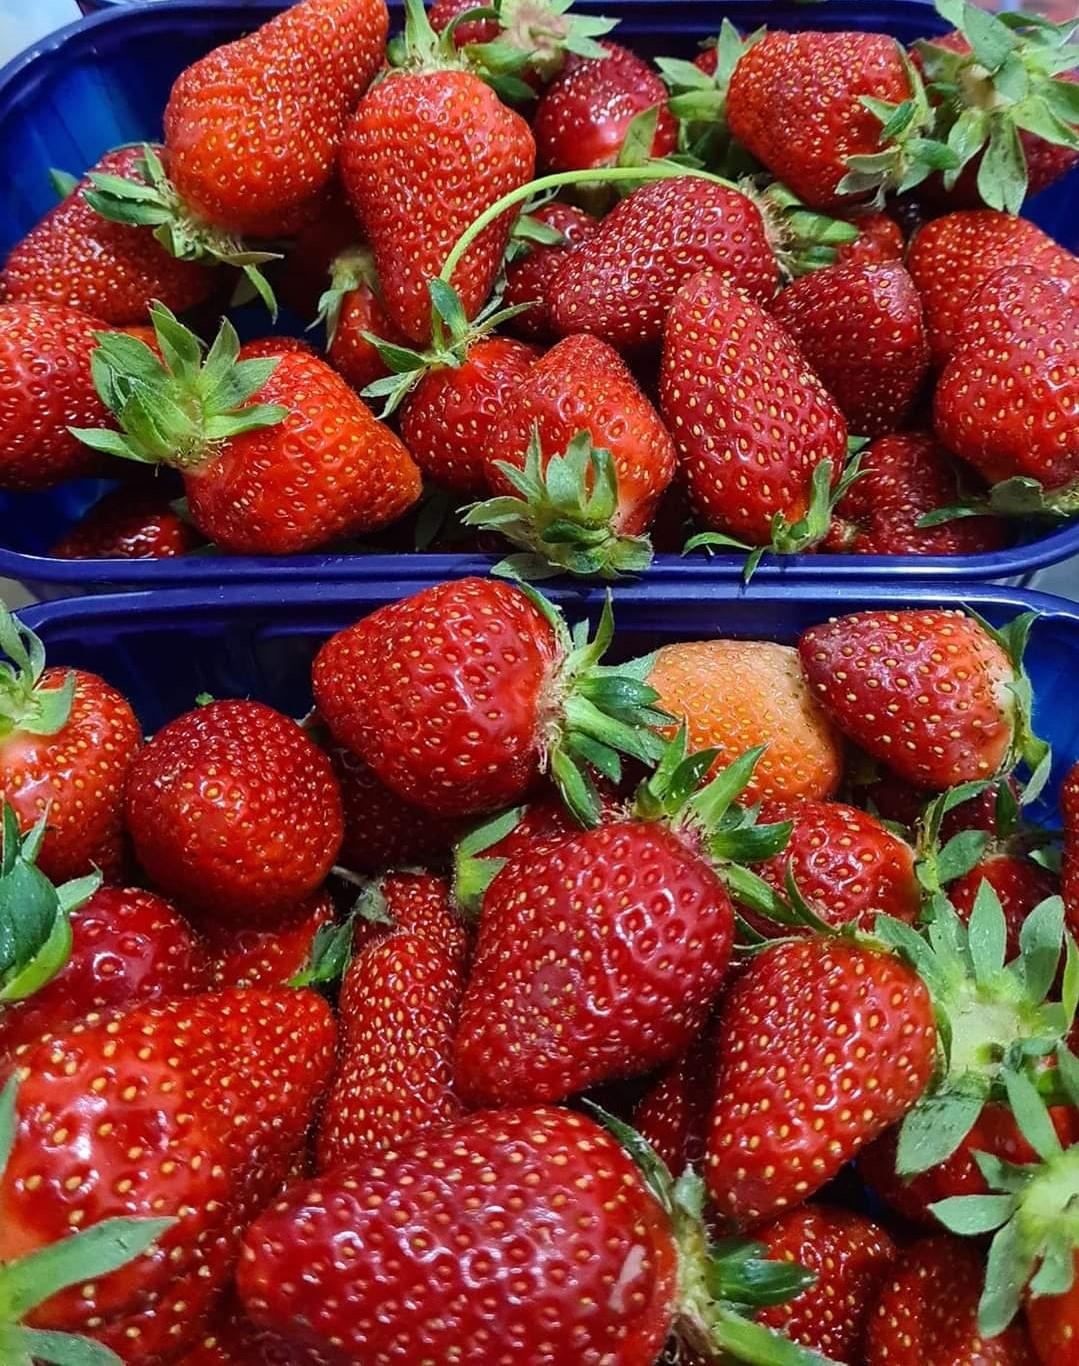 Croatian Strawberries from Vrgorac